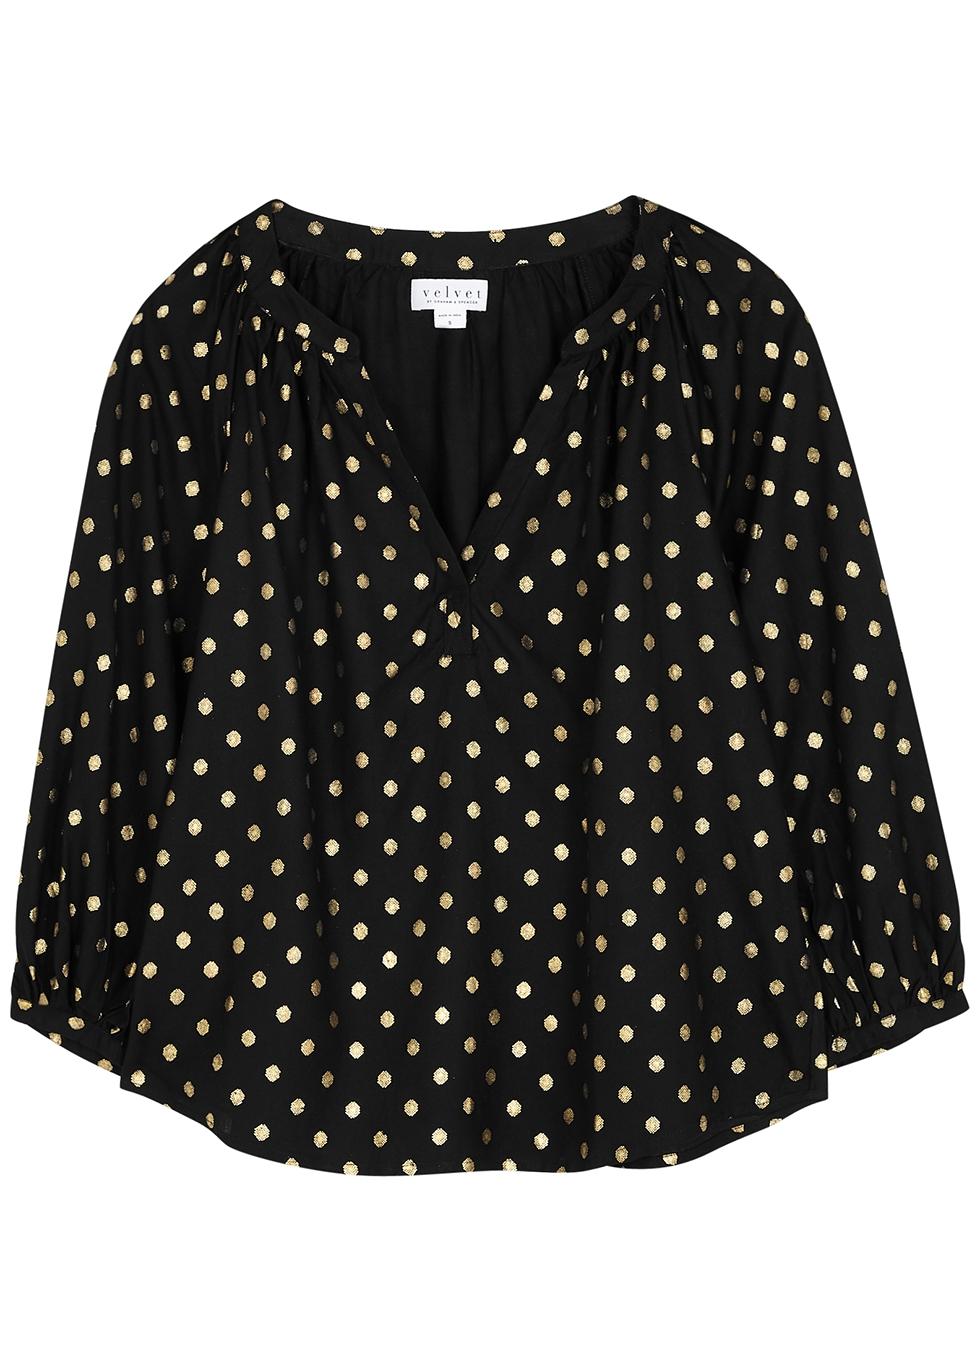 Maisee black polka-dot foil-print blouse